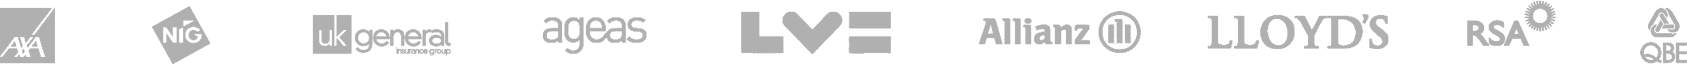 business-insurance-trust-logos